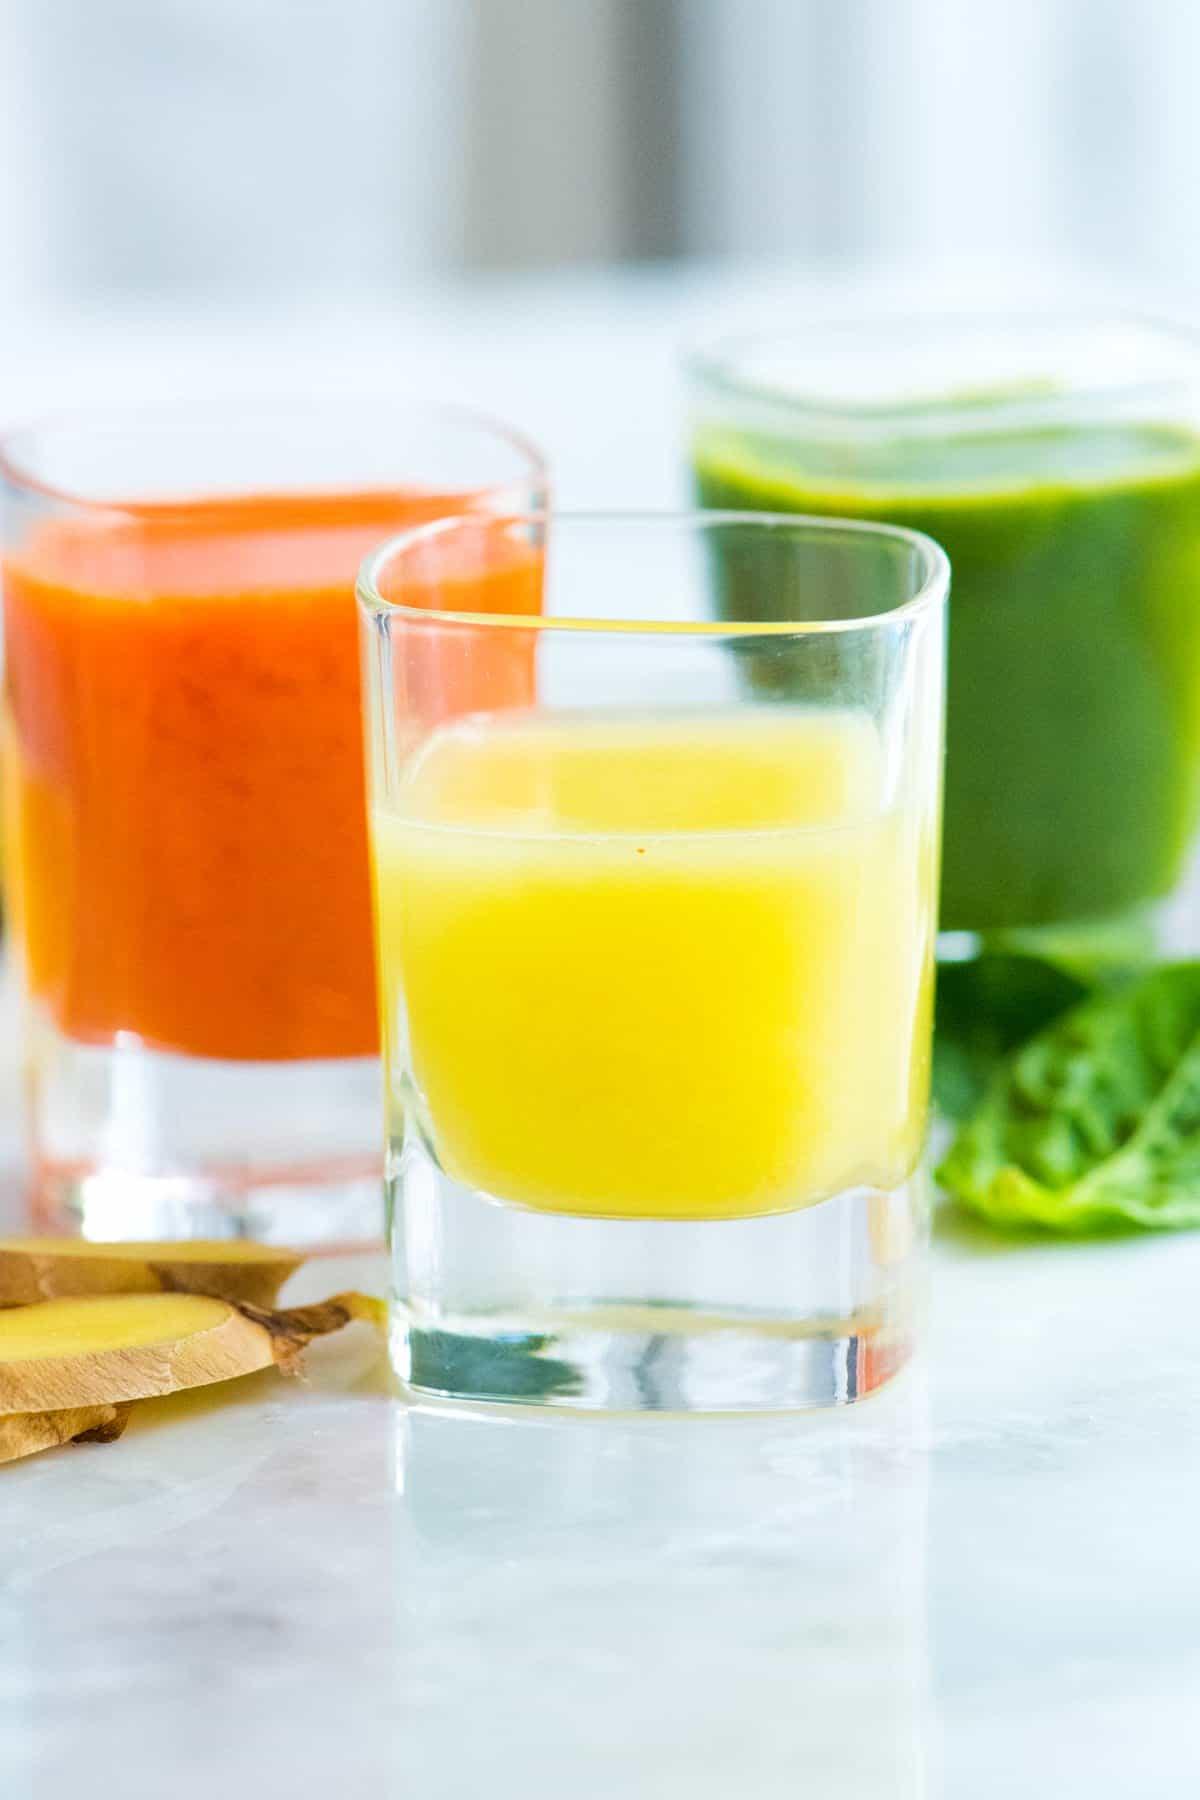 Three Ginger Power Shot Recipes including Lemon Ginger, Carrot Ginger and a Green Apple Ginger Shot